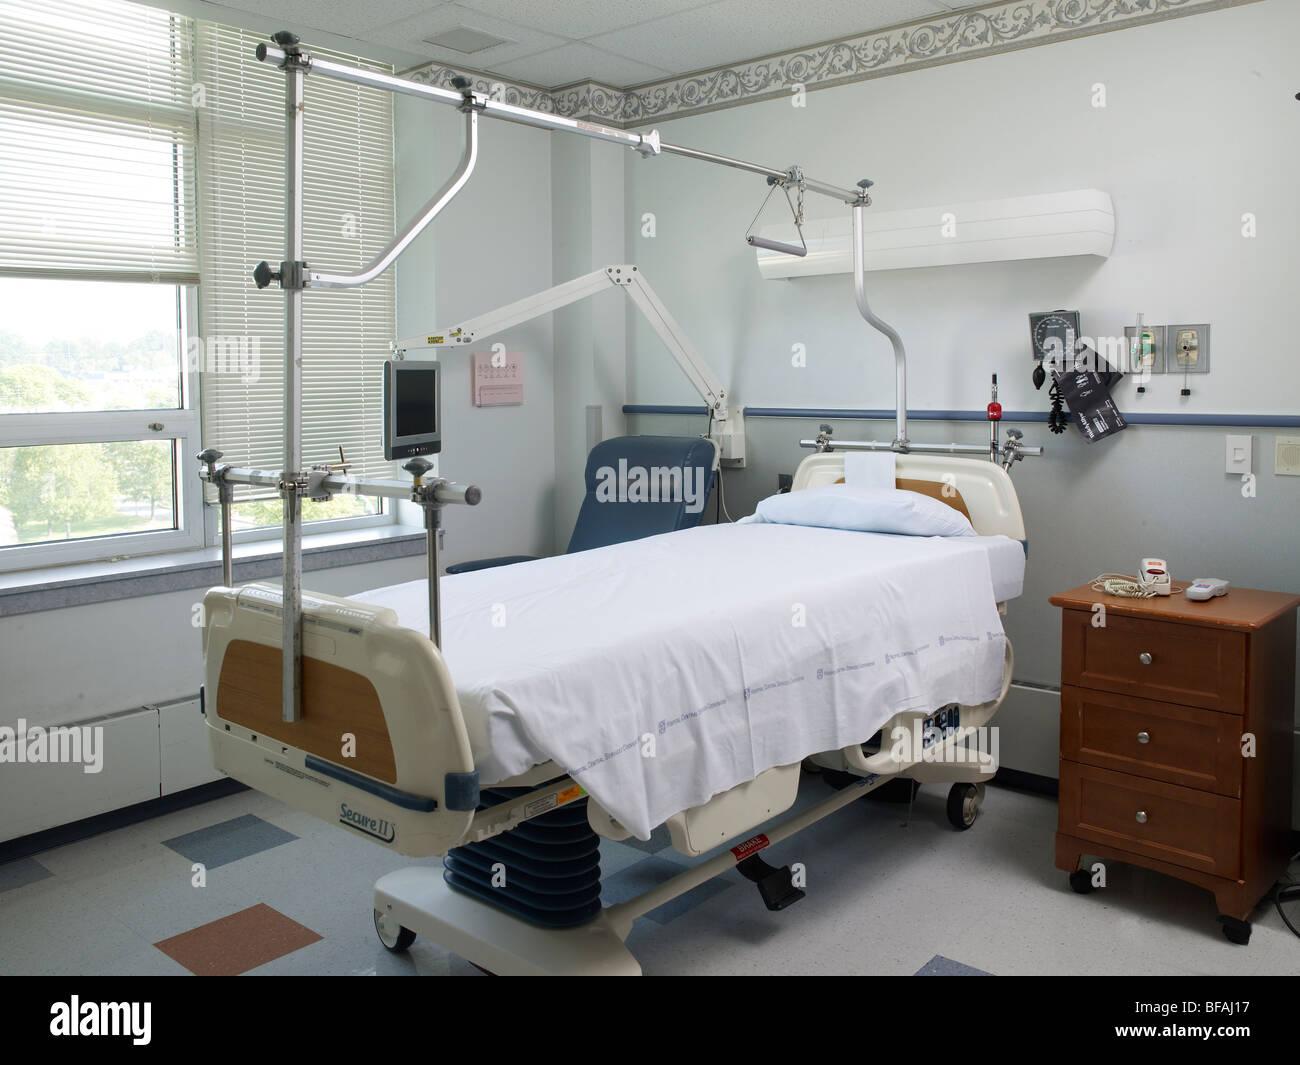 Genial Hospital Bed In Empty Hospital Room, USA